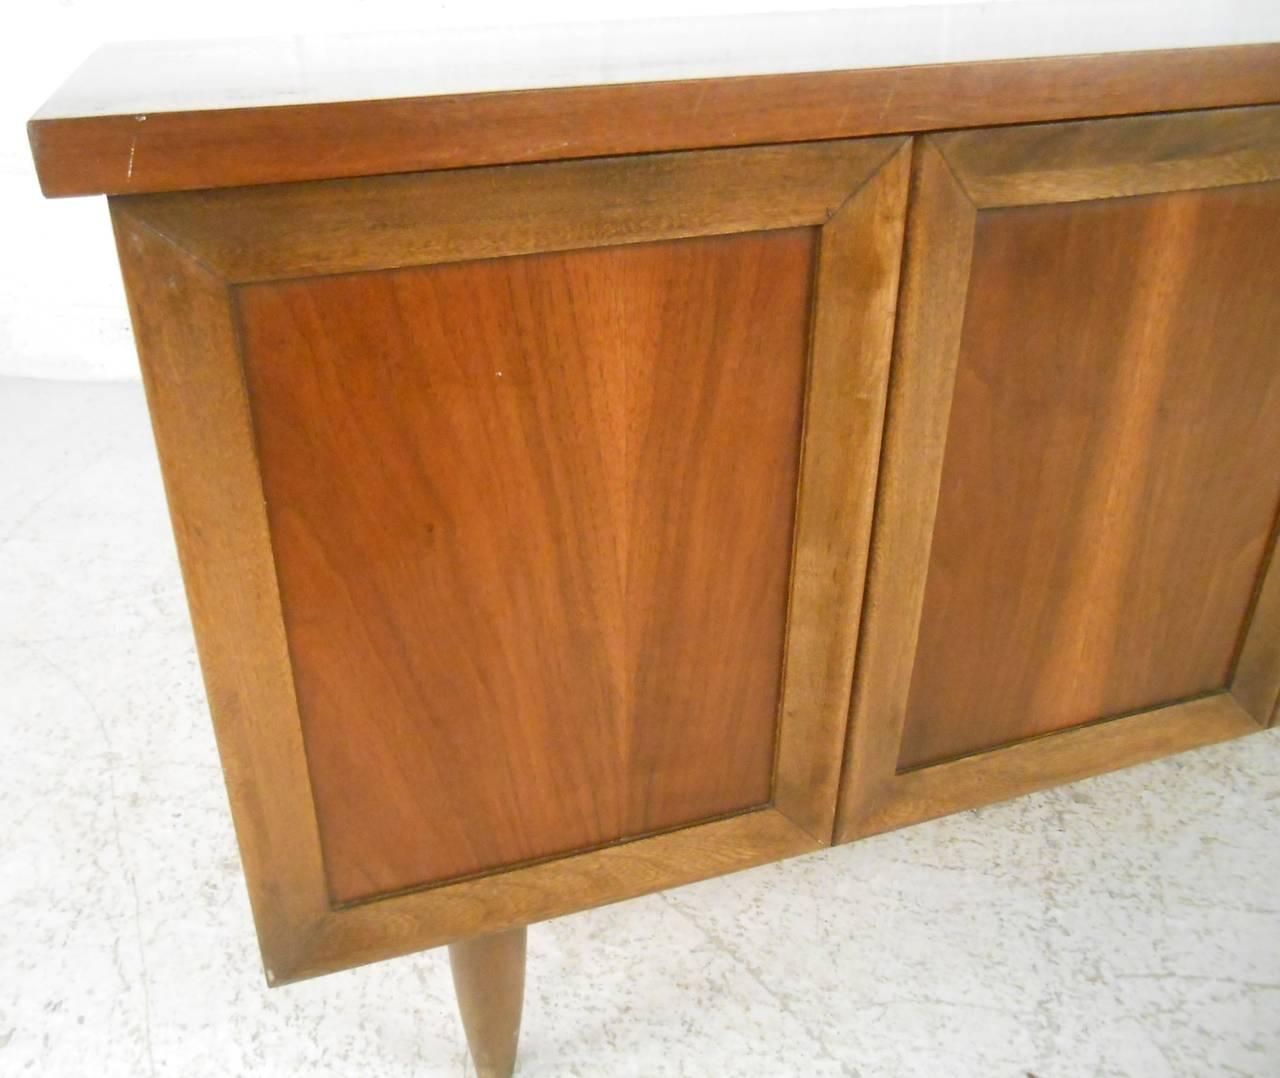 Wood Vintage Blanket Chest by Lane Furniture